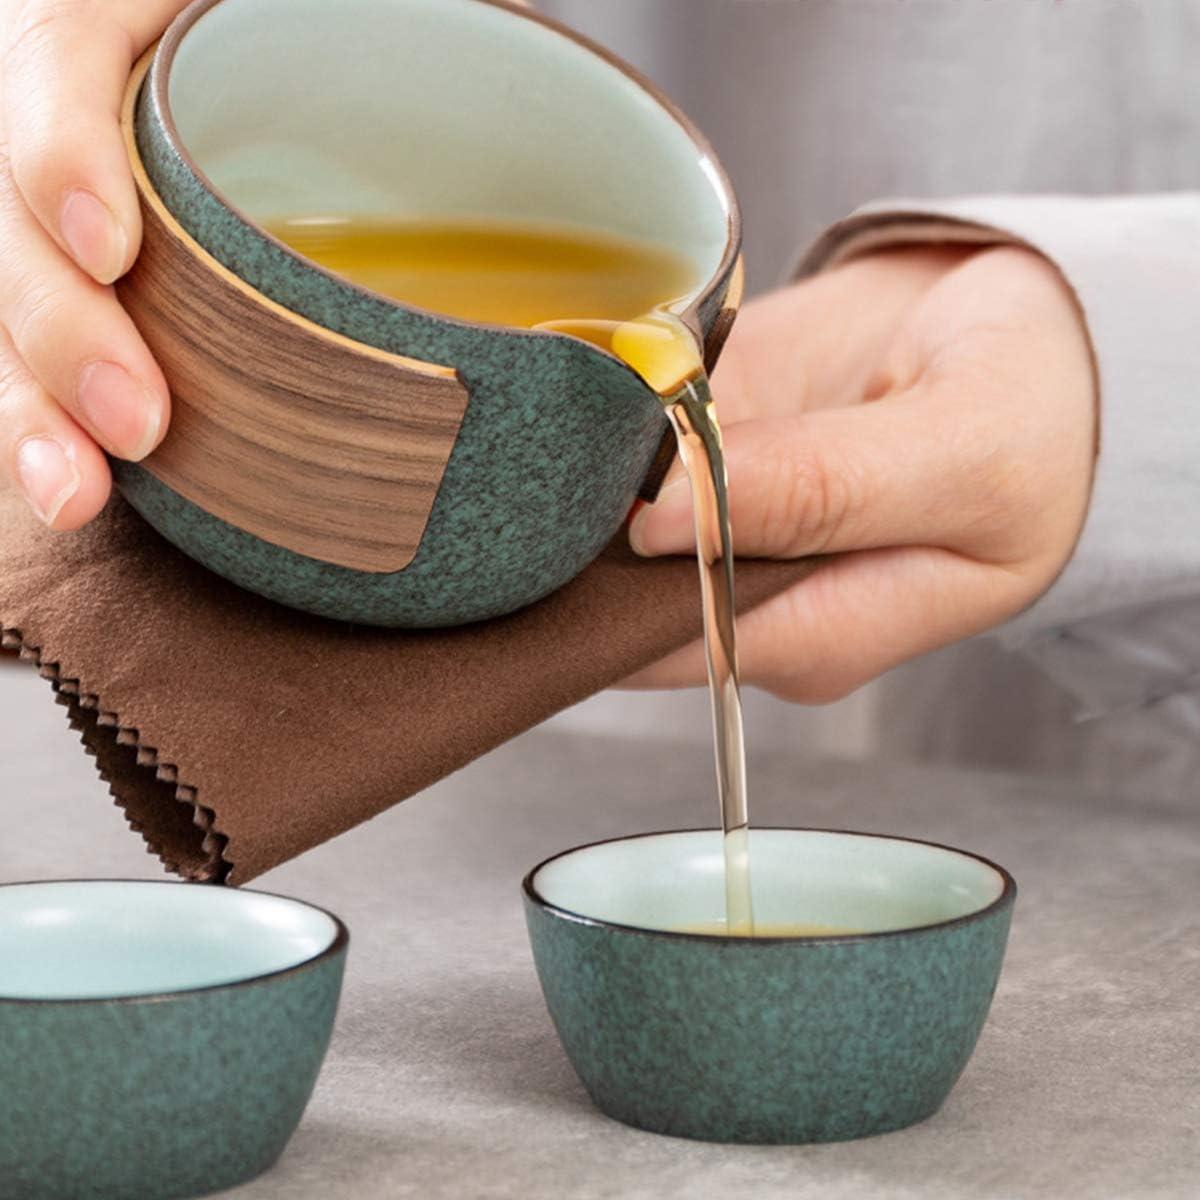 1 Pot 2 Cups Porcelain Teacups with Tea Infuser Portable Bag for Outdoor Picnic Mini Travel Ceramic Tea Pot Set Chinese Kung Fu Teapot Black